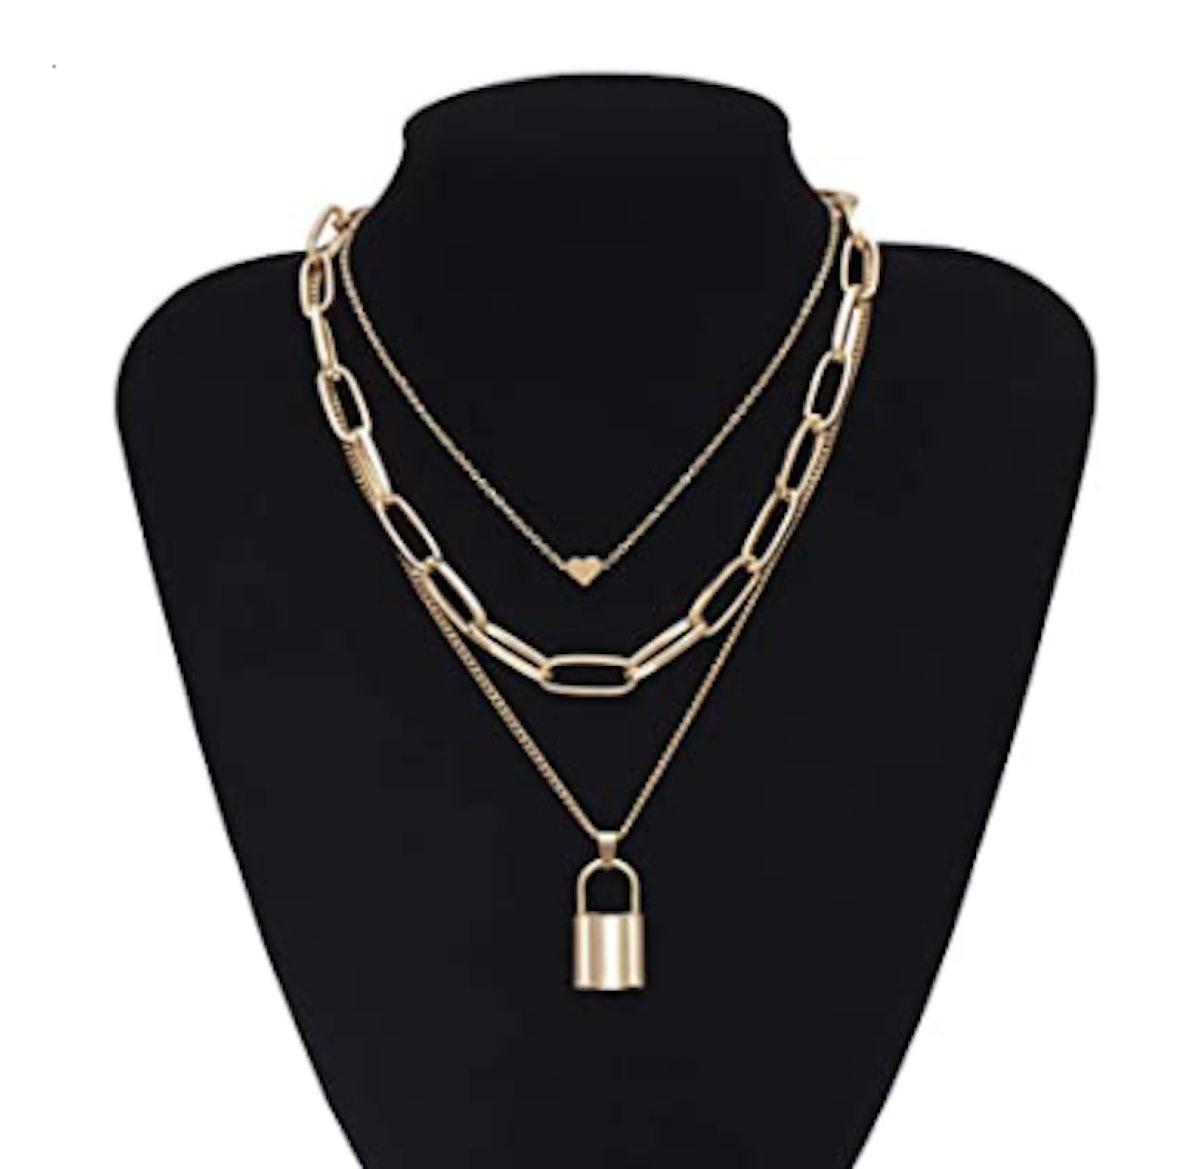 Salircon Layered Necklace Lock & Key Pendant